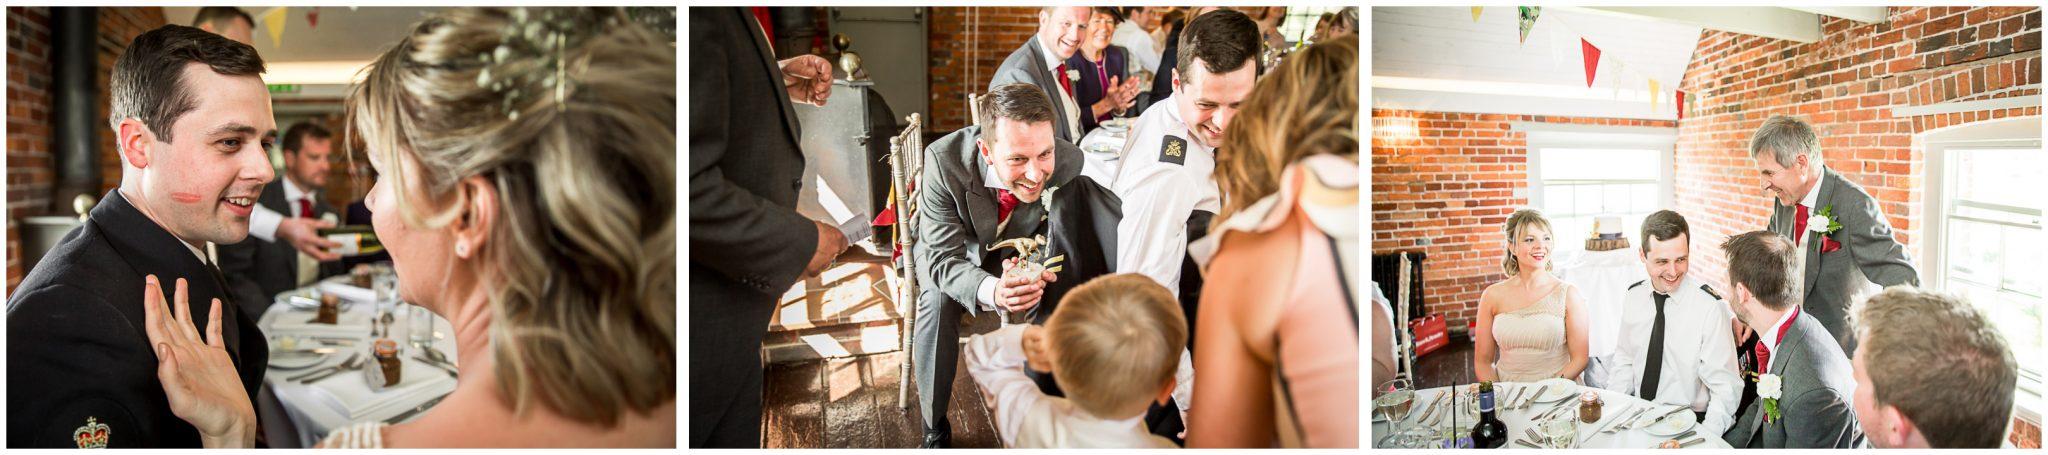 Sopley wedding photographer dining room